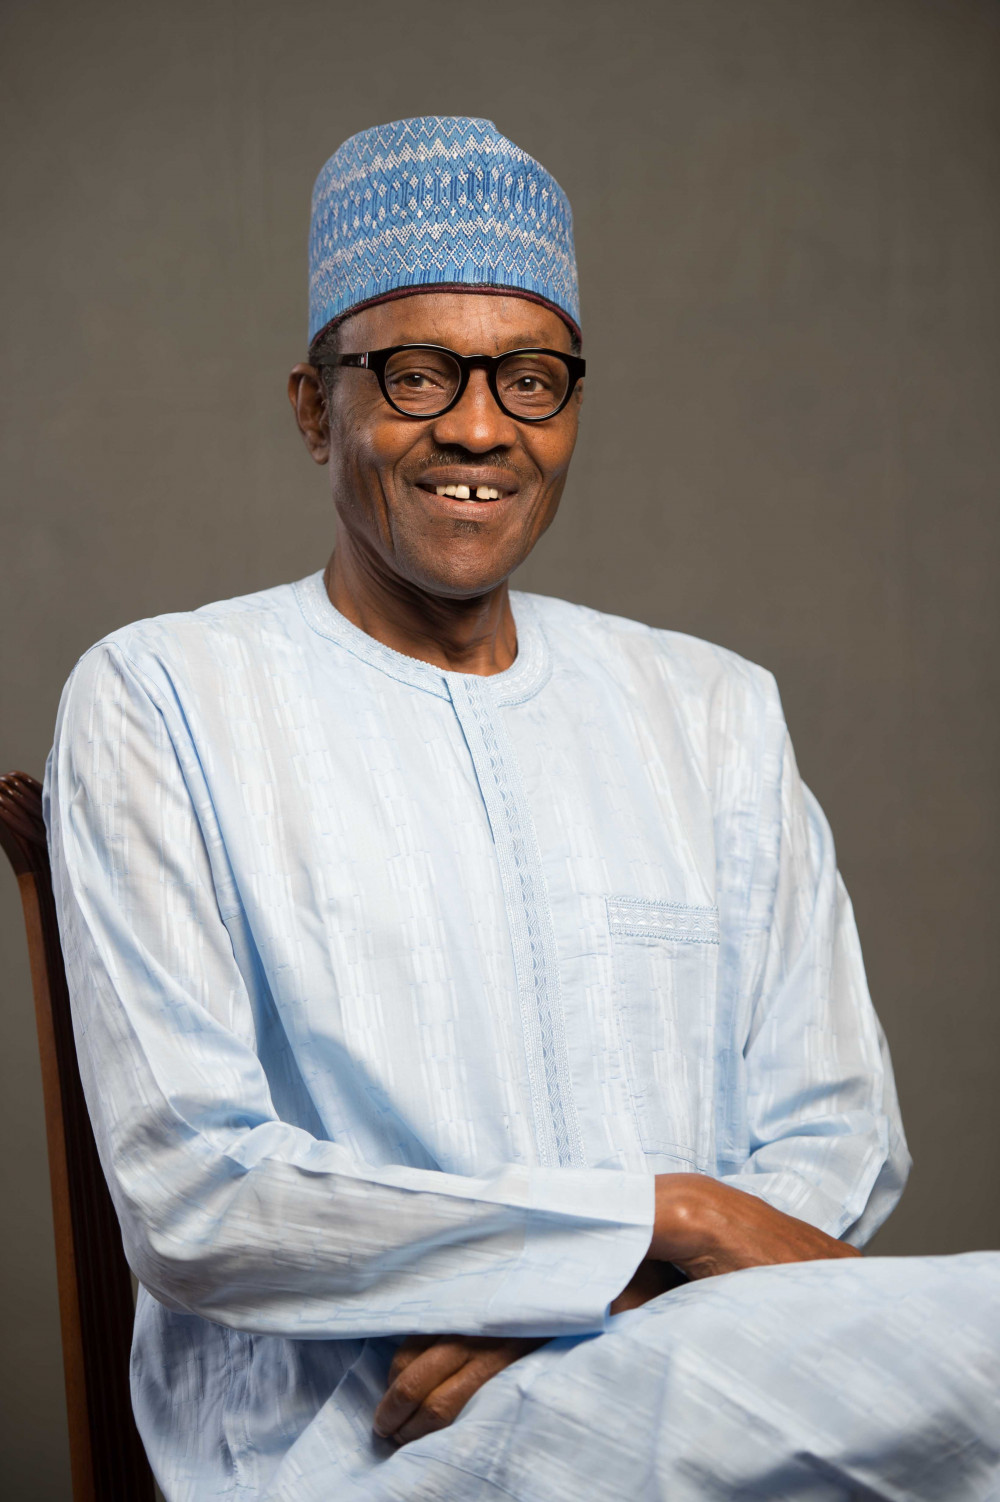 http://www.bellanaija.com/wp-content/uploads/2014/11/Buhari-2015-BN-9.jpg